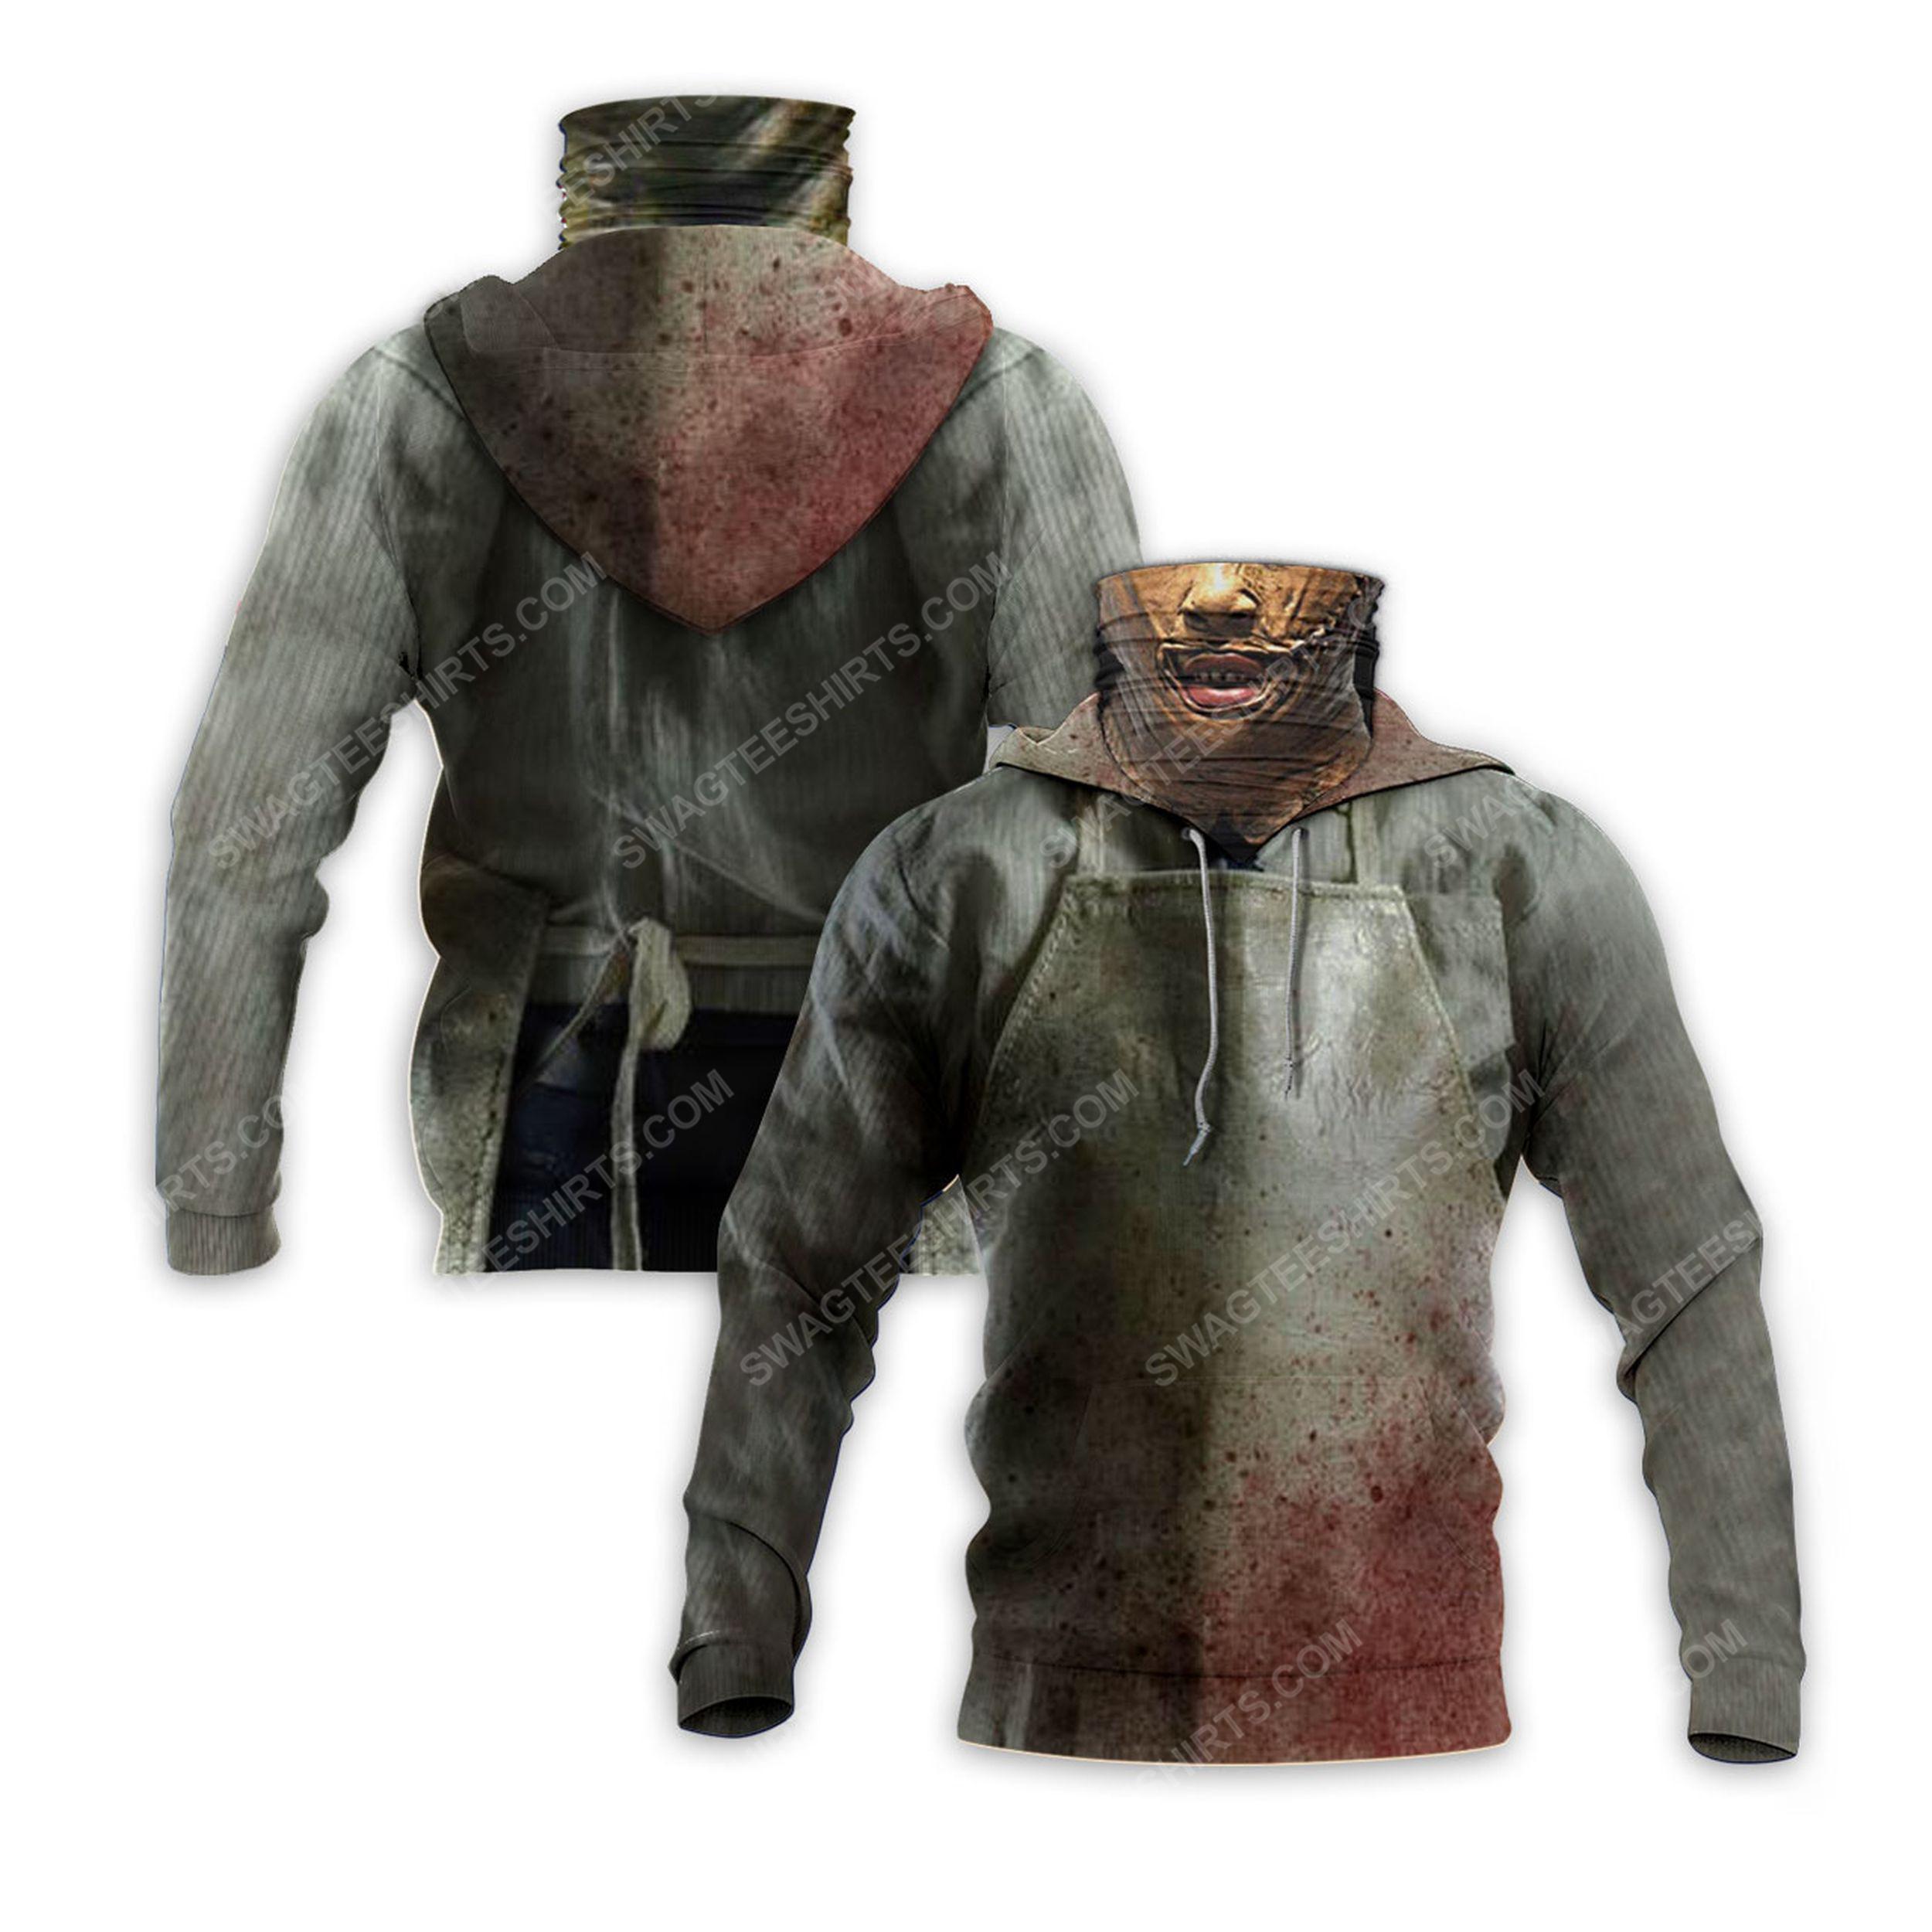 Horror movie leatherface for halloween full print mask hoodie 2(1)